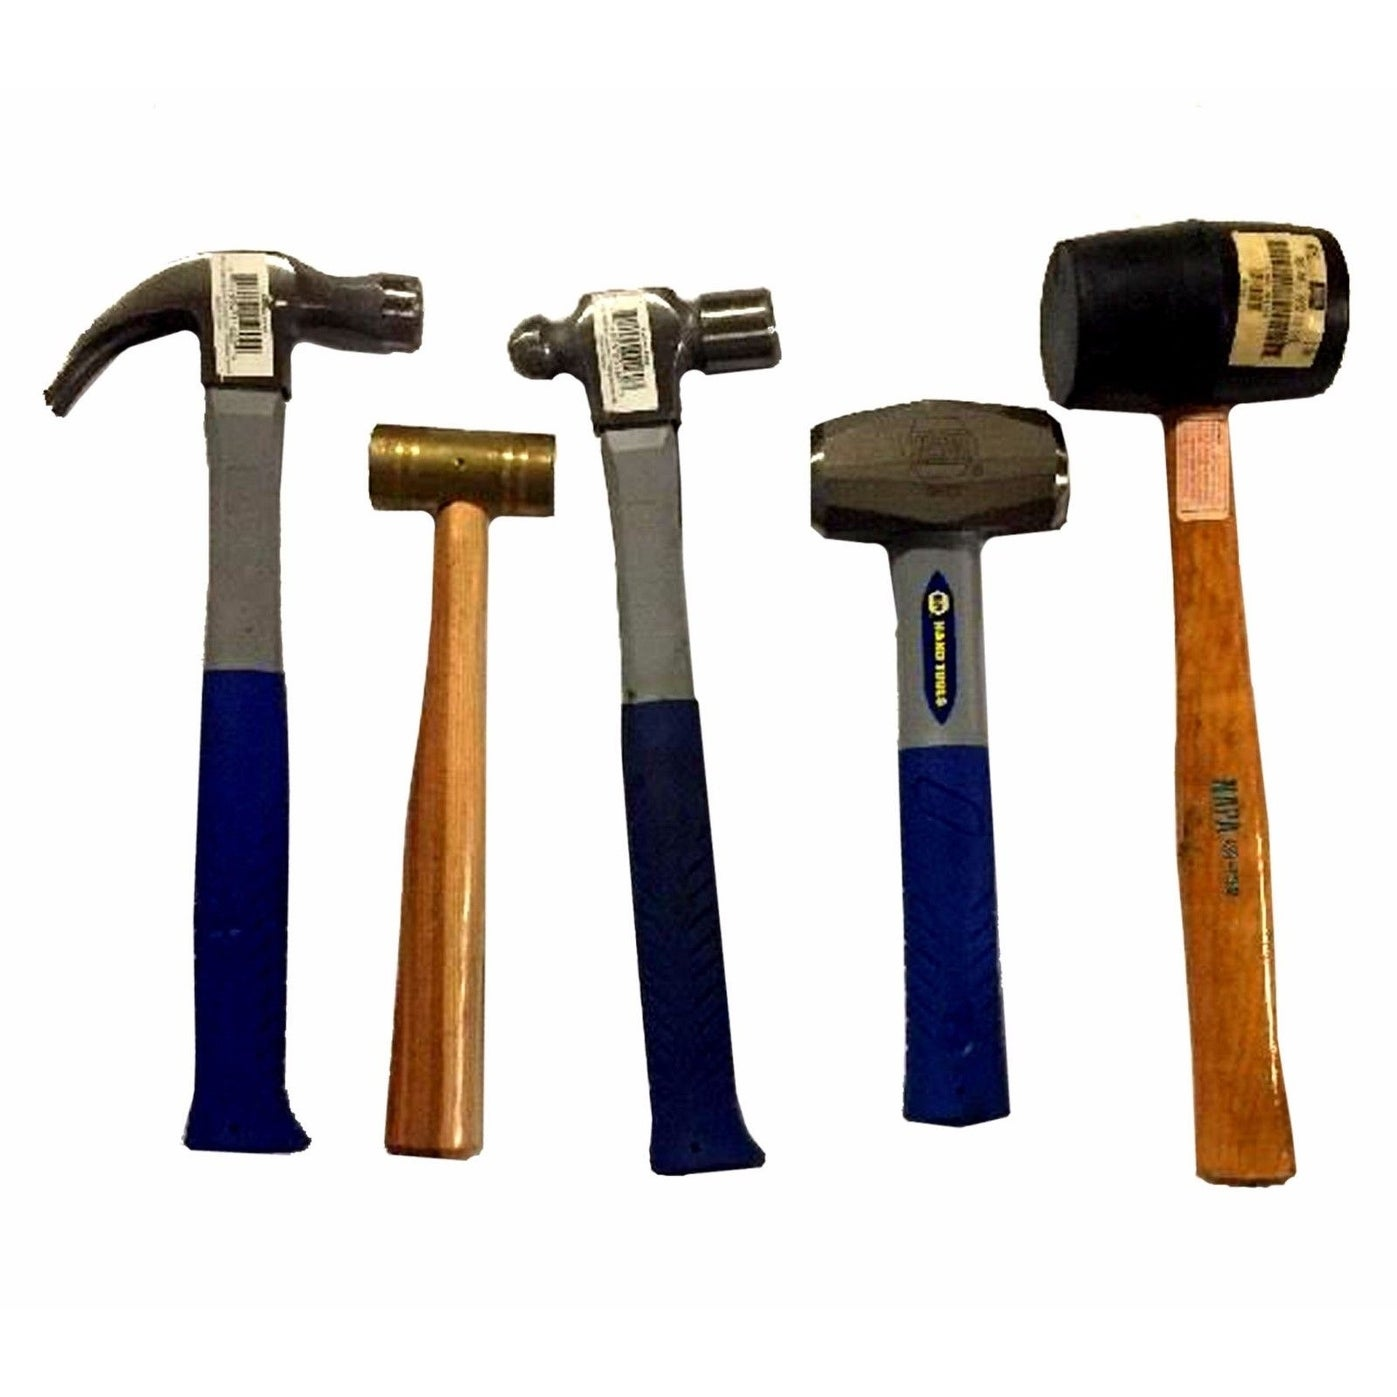 NAPA Ball Peen Hammer 16 oz Fiberglass Cushion Grip Handle